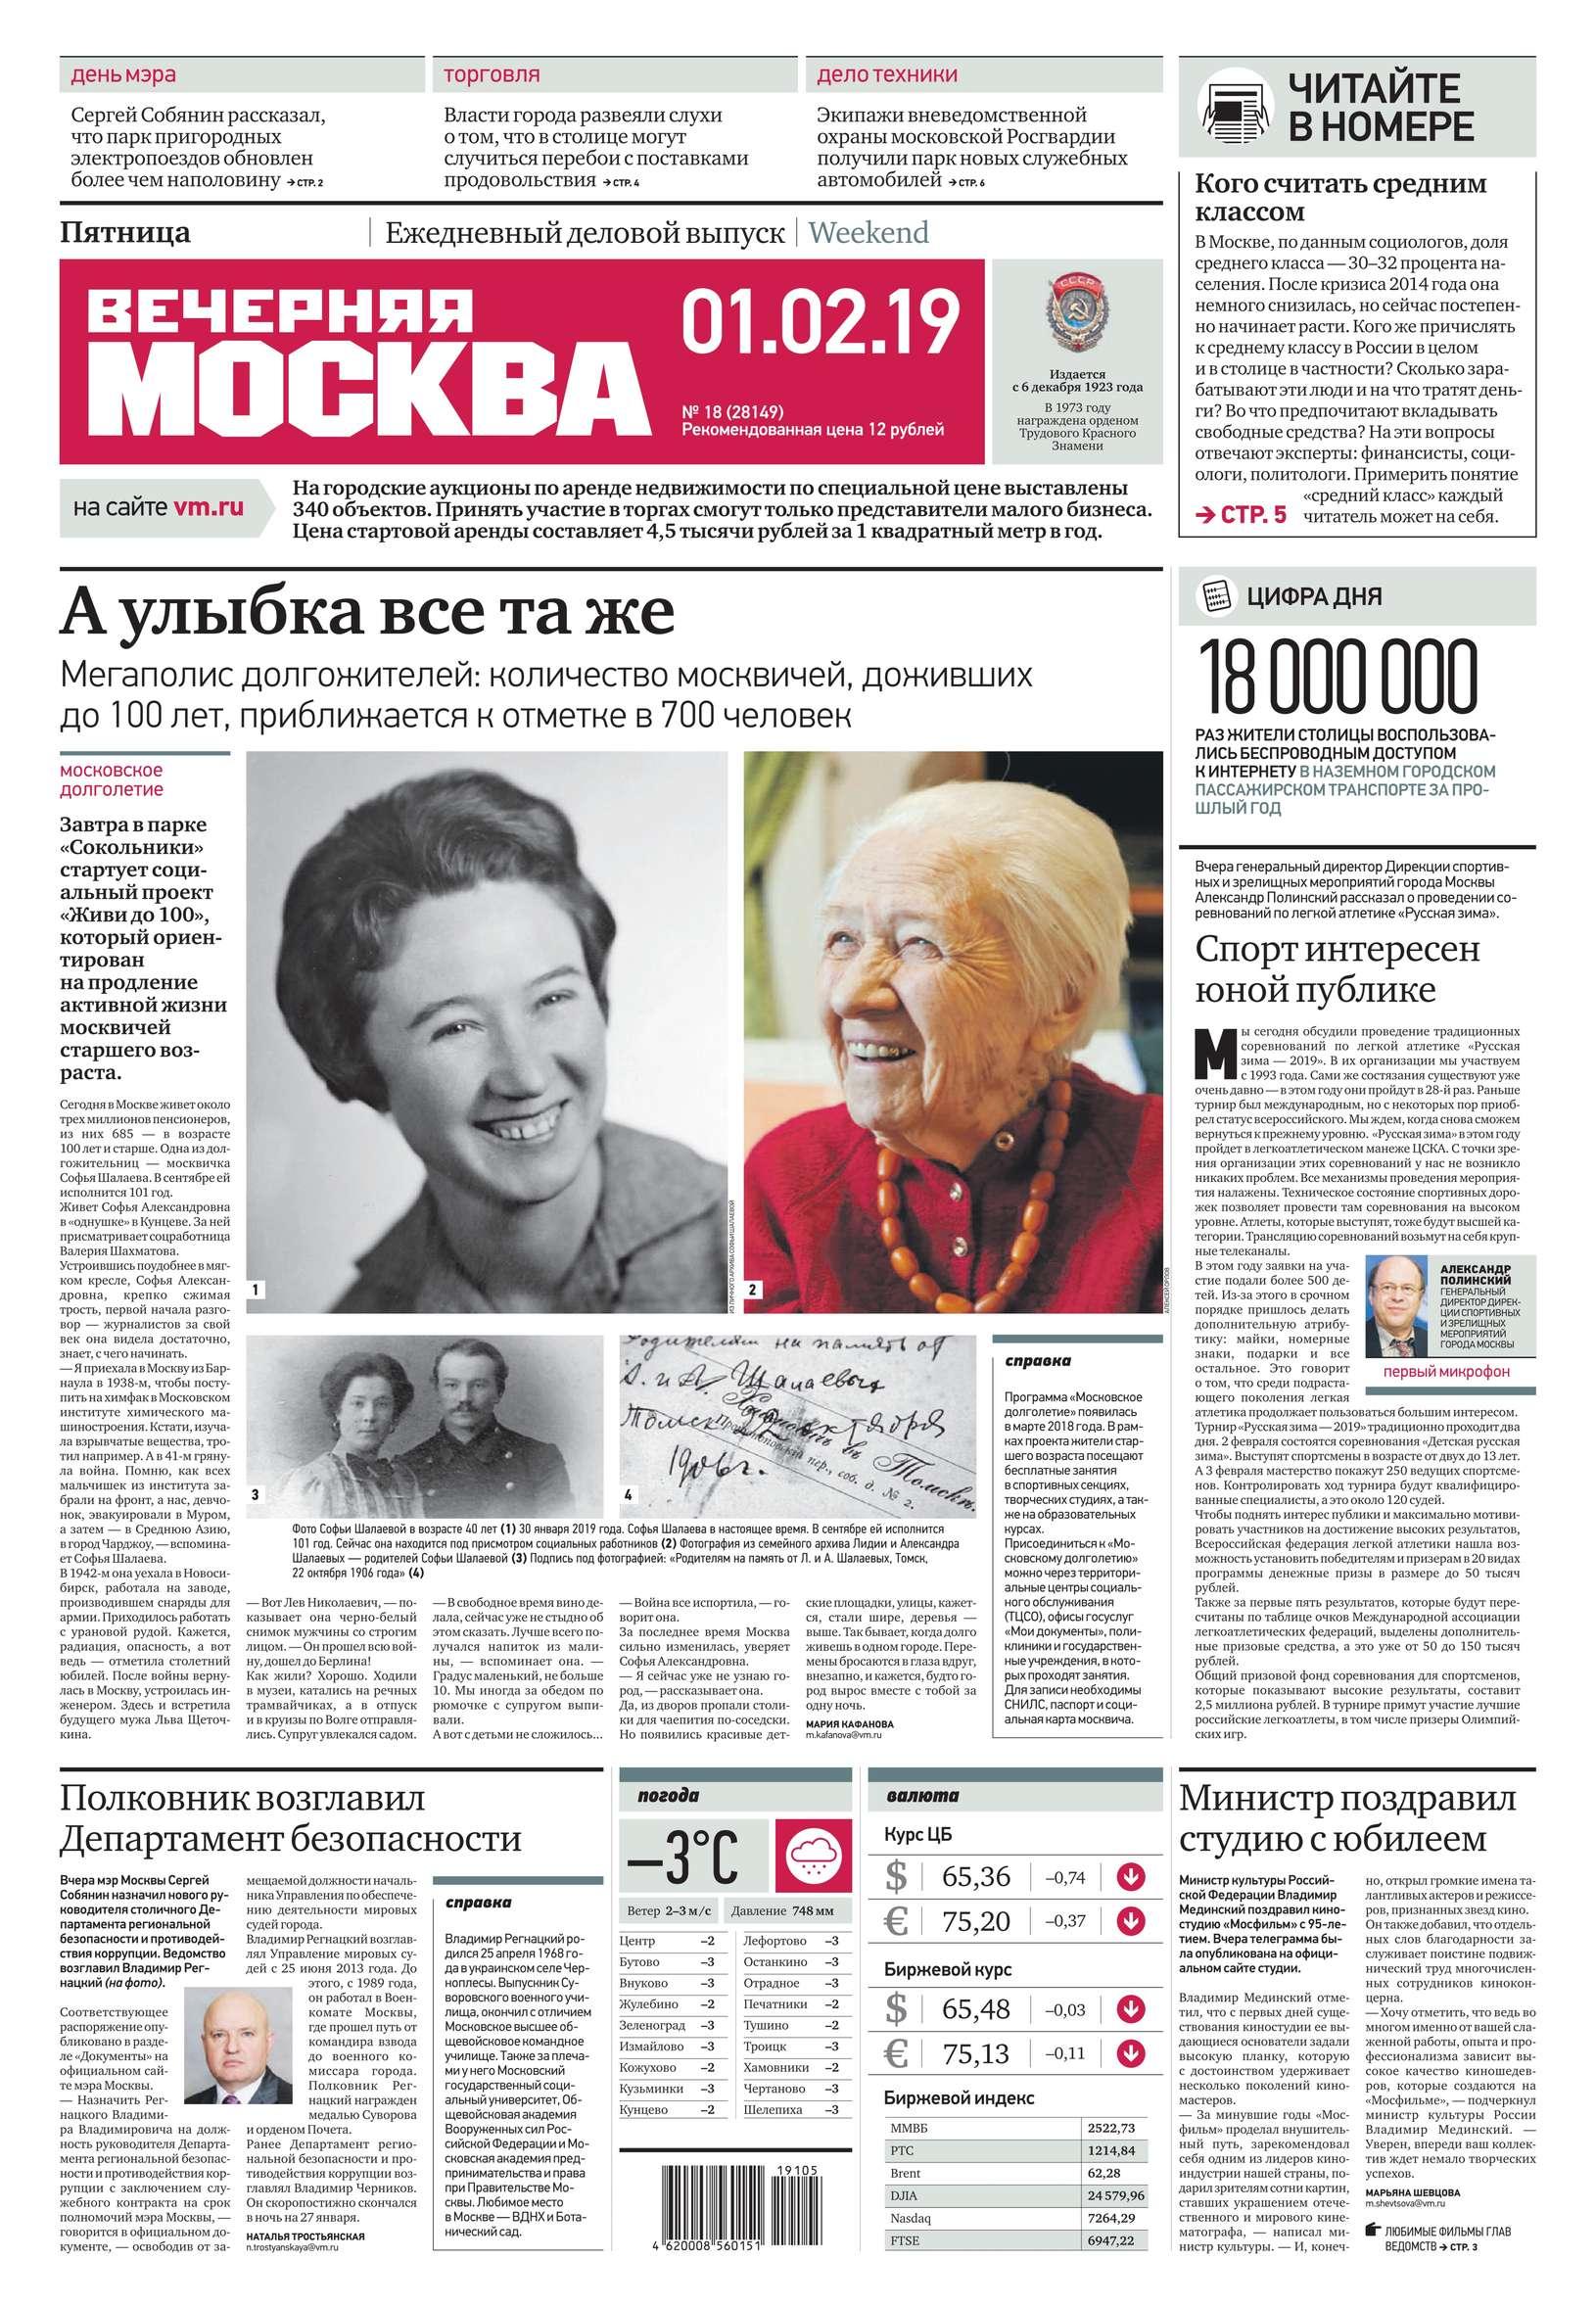 Редакция газеты Вечерняя Москва Вечерняя Москва 18-2019 вечерняя москва 2019 08 06t20 30